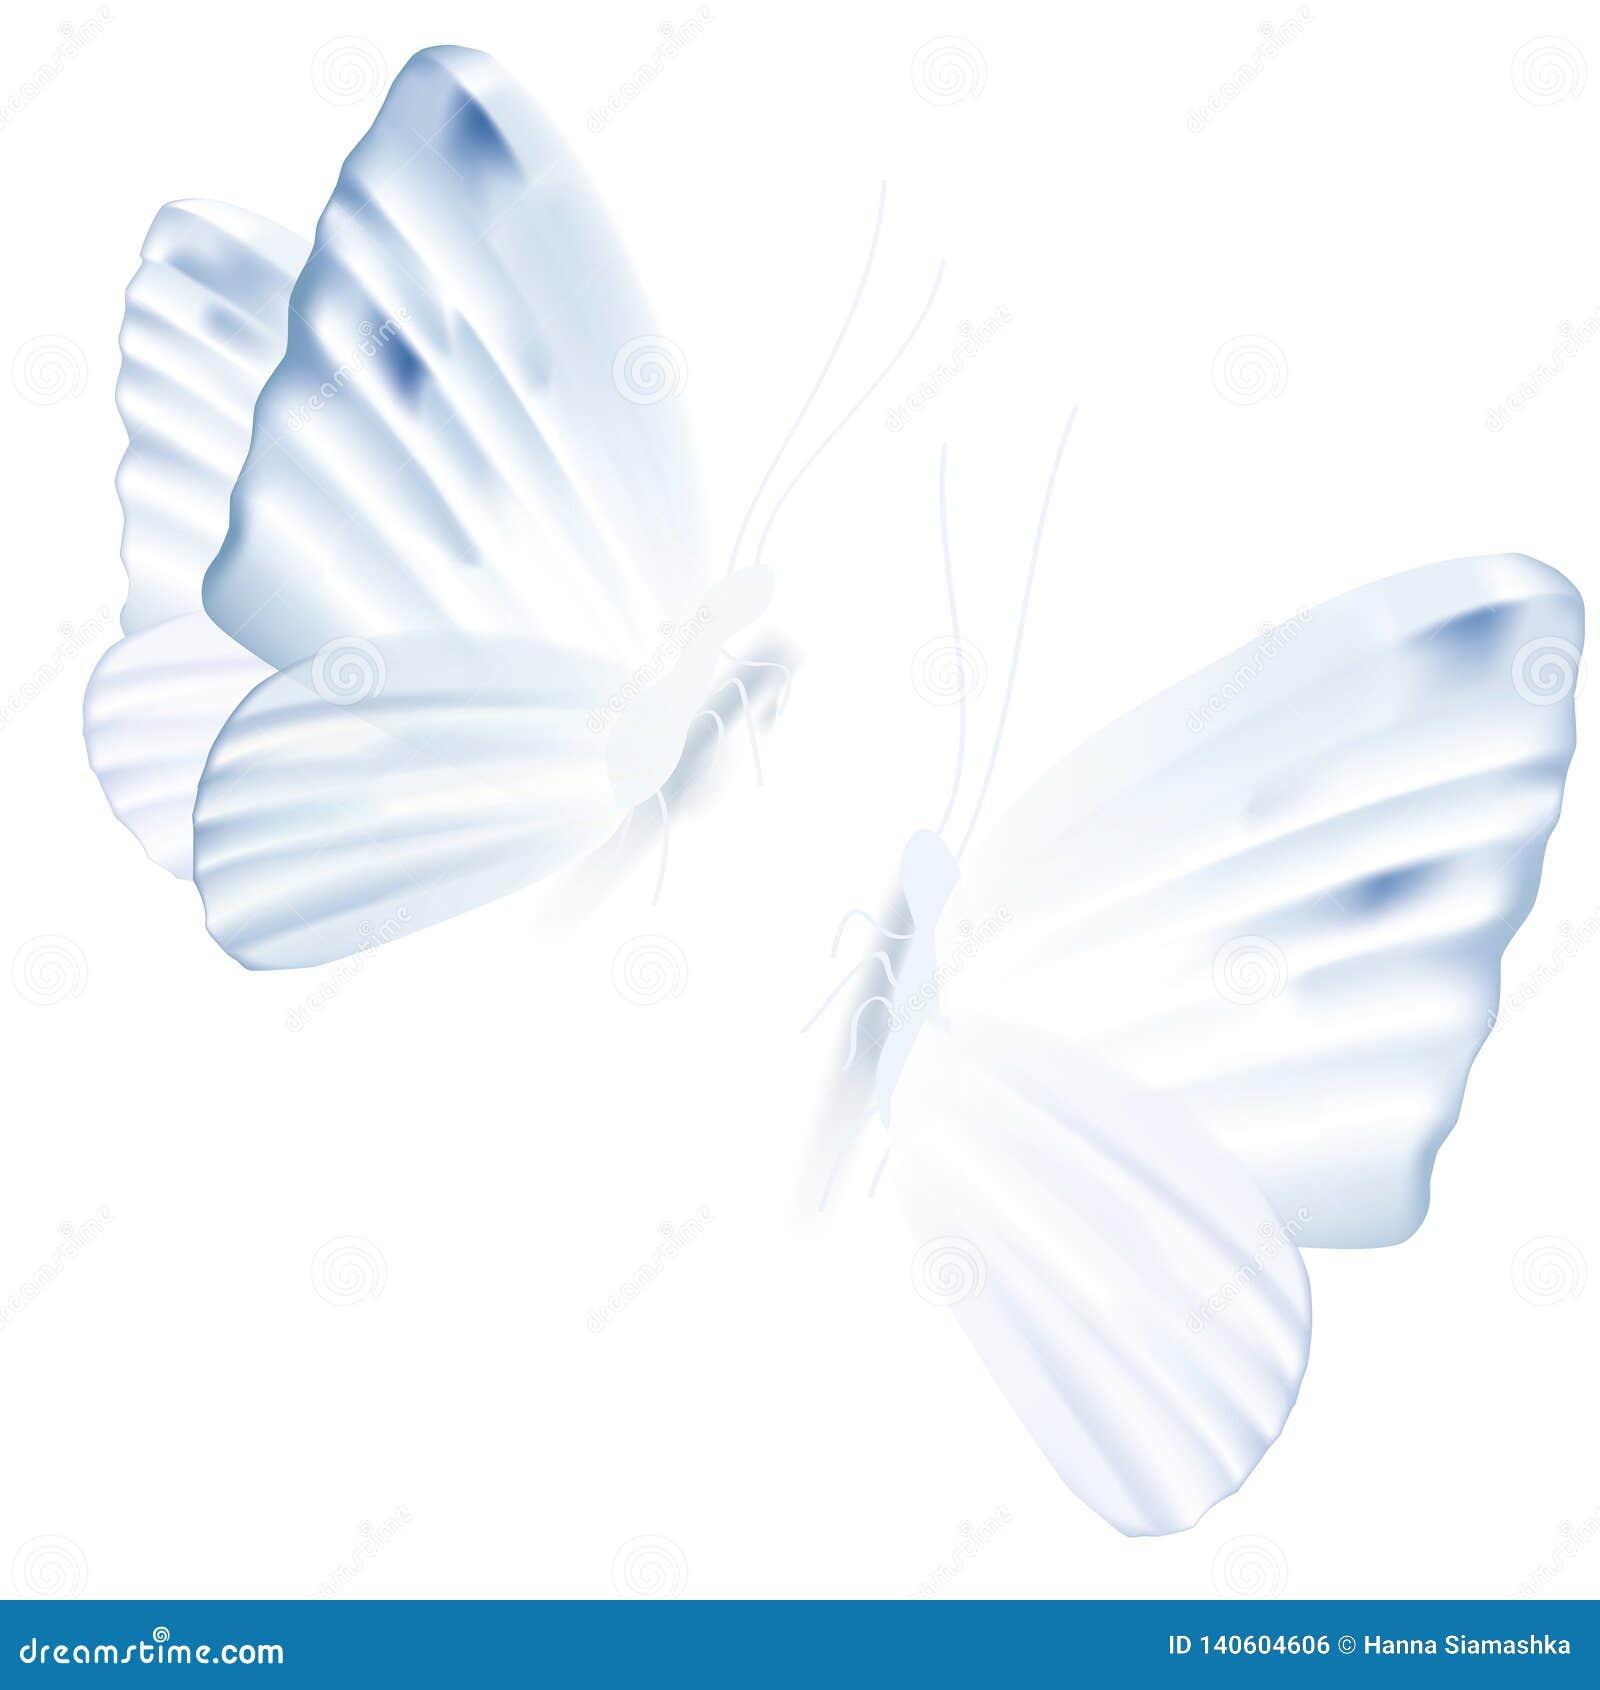 Vector illustration of two light blue butterflies